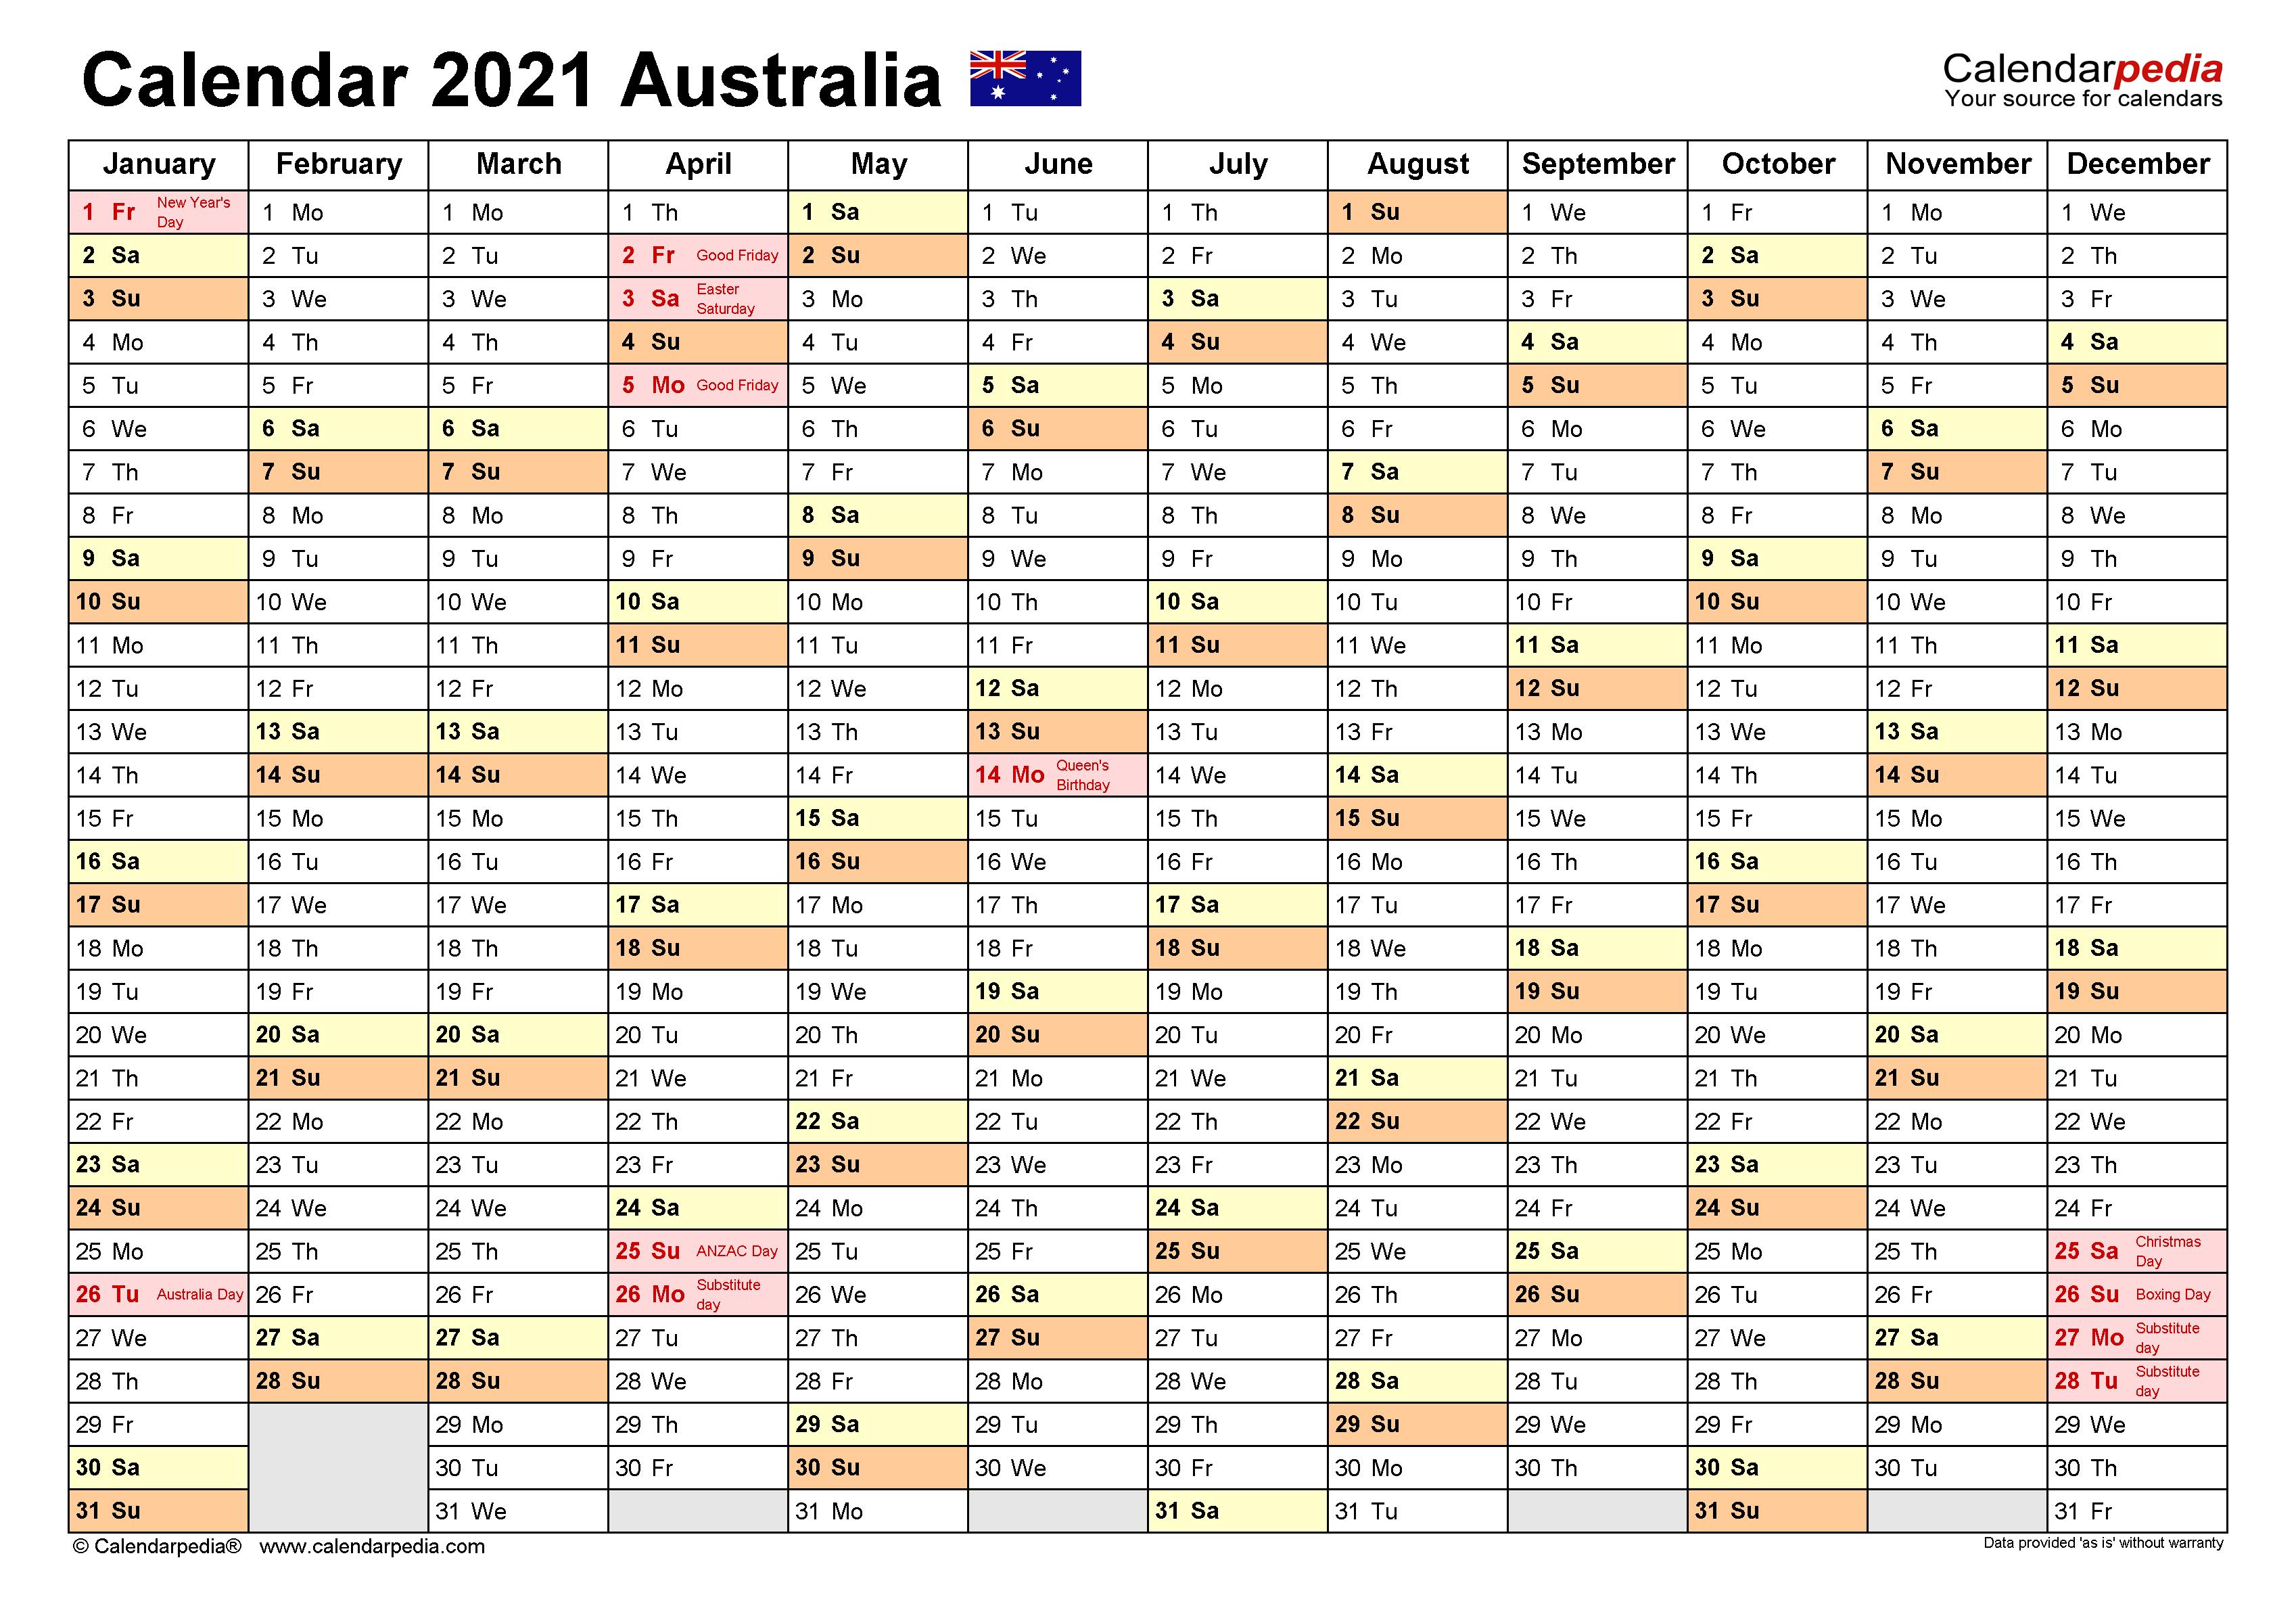 Australia Calendar 2021 - Free Printable Excel templates